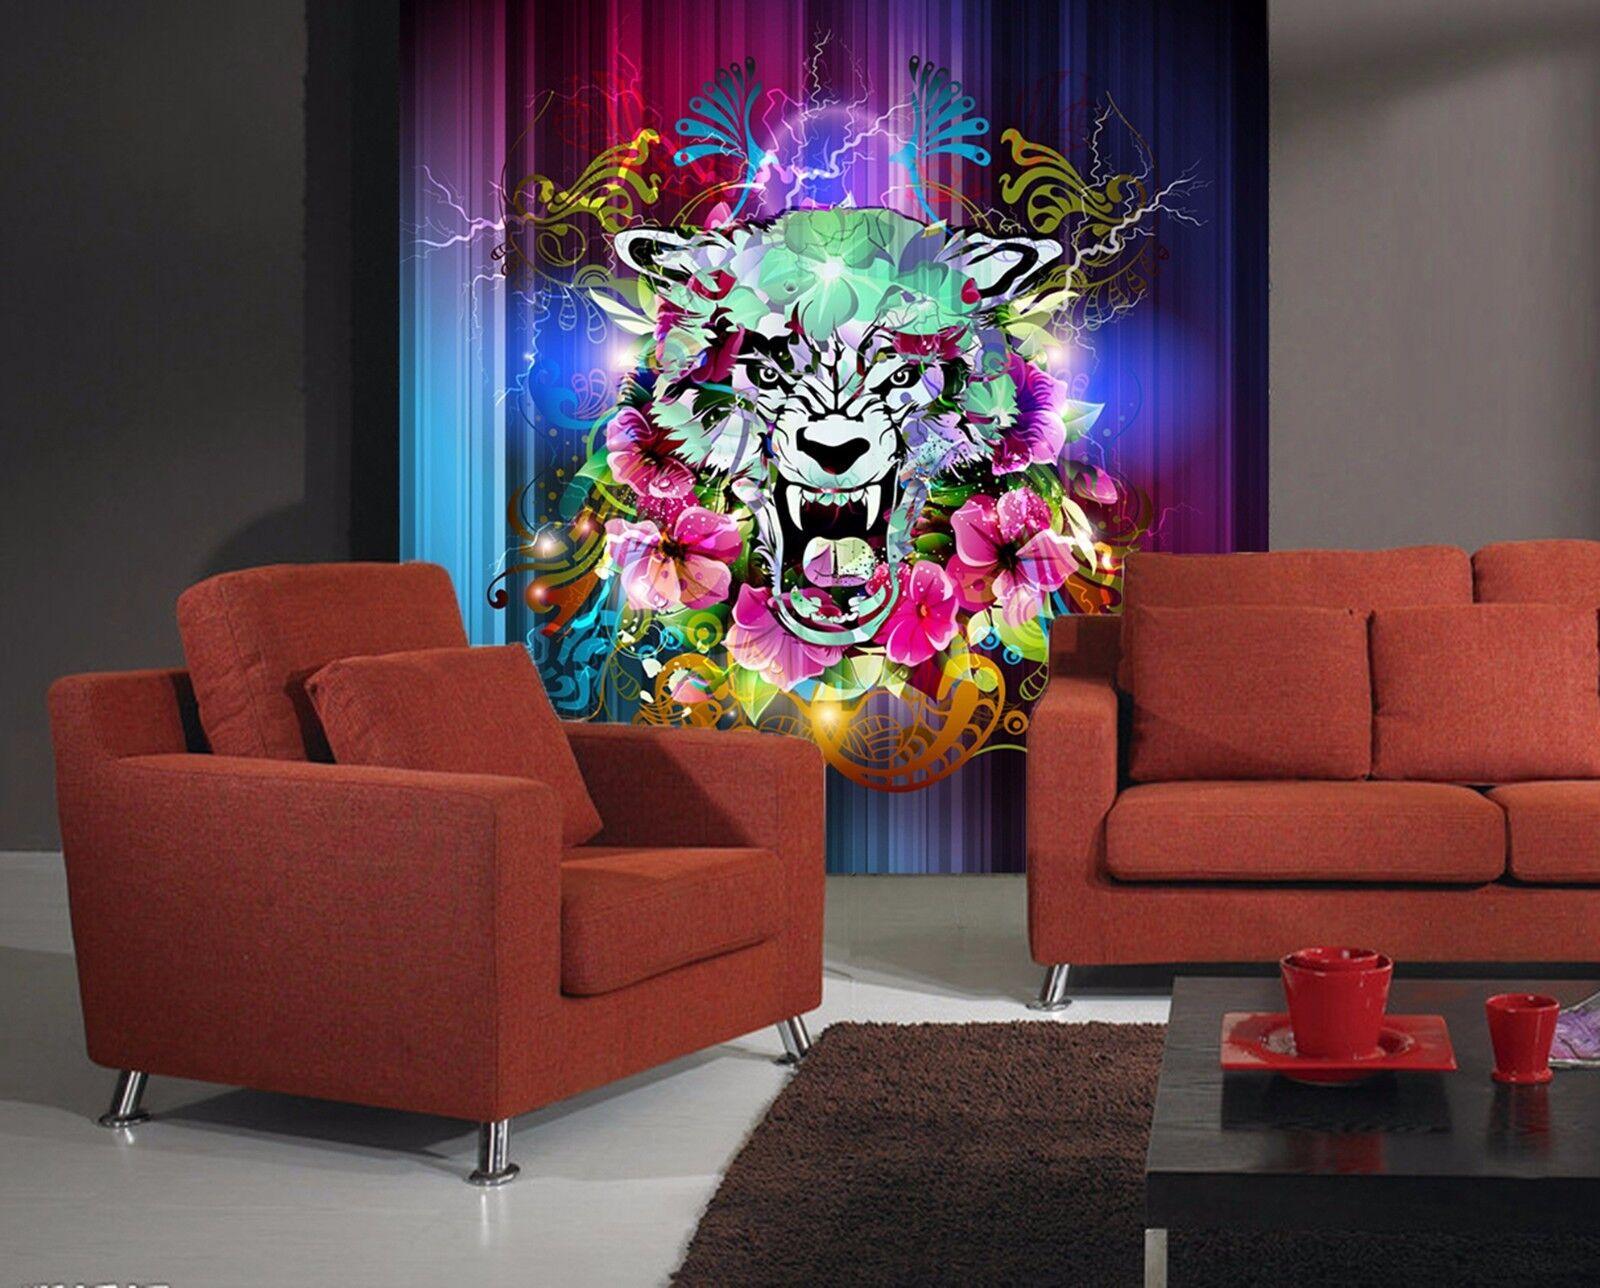 3D Tiger Graffiti 724 Wallpaper Wallpaper Wallpaper Mural Paper Wall Print Wallpaper Murals UK 03757b